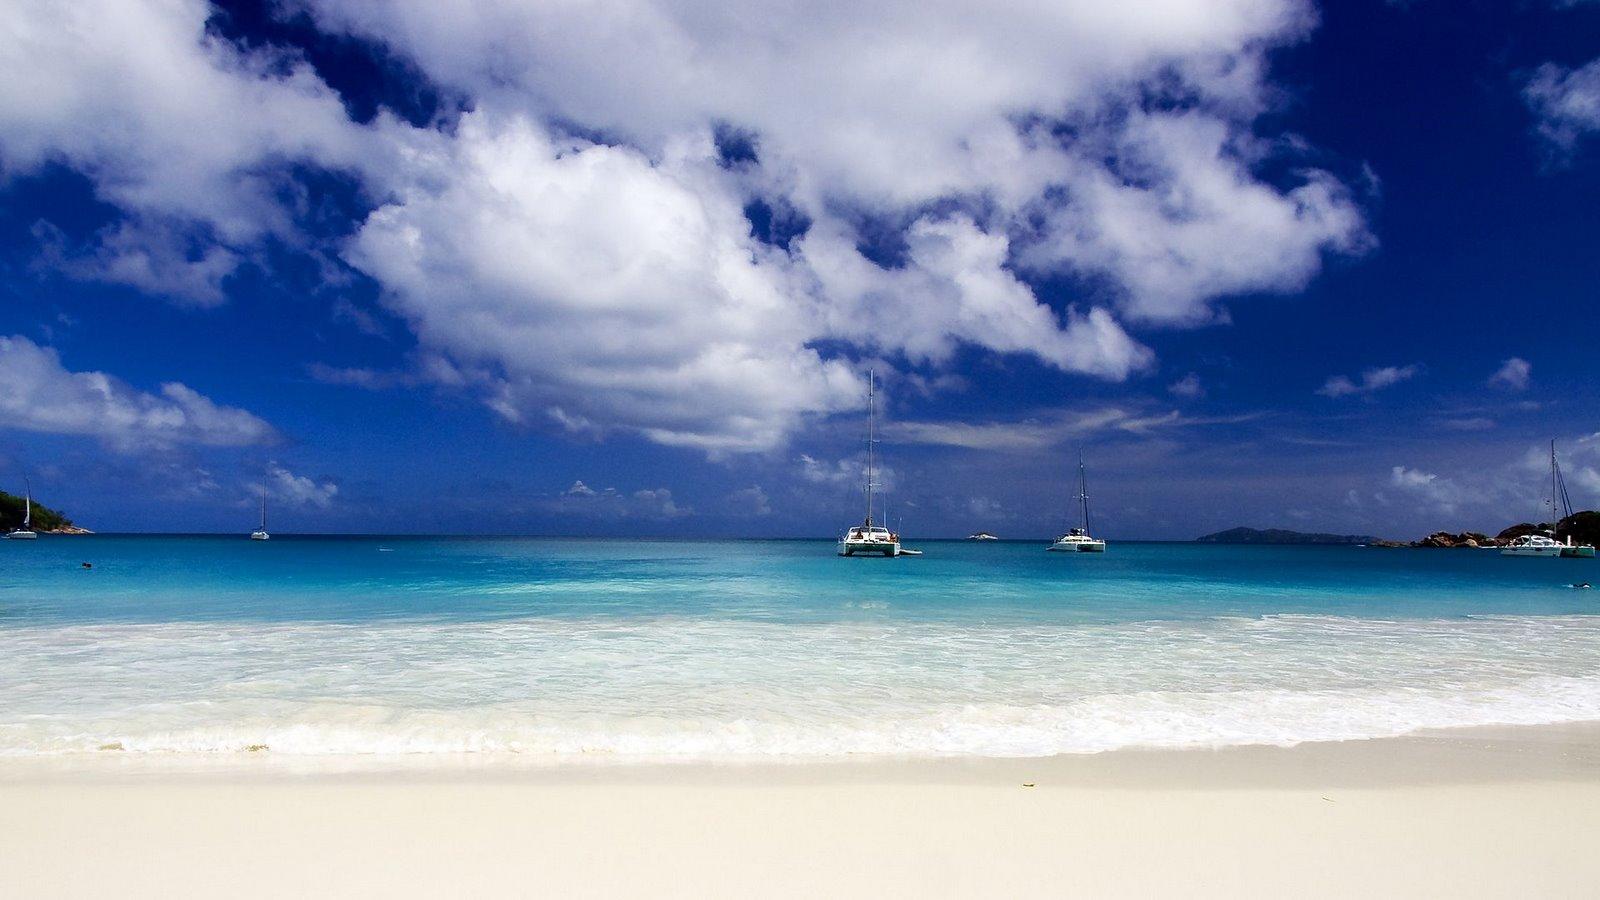 hd resolutionssea beach - photo #22